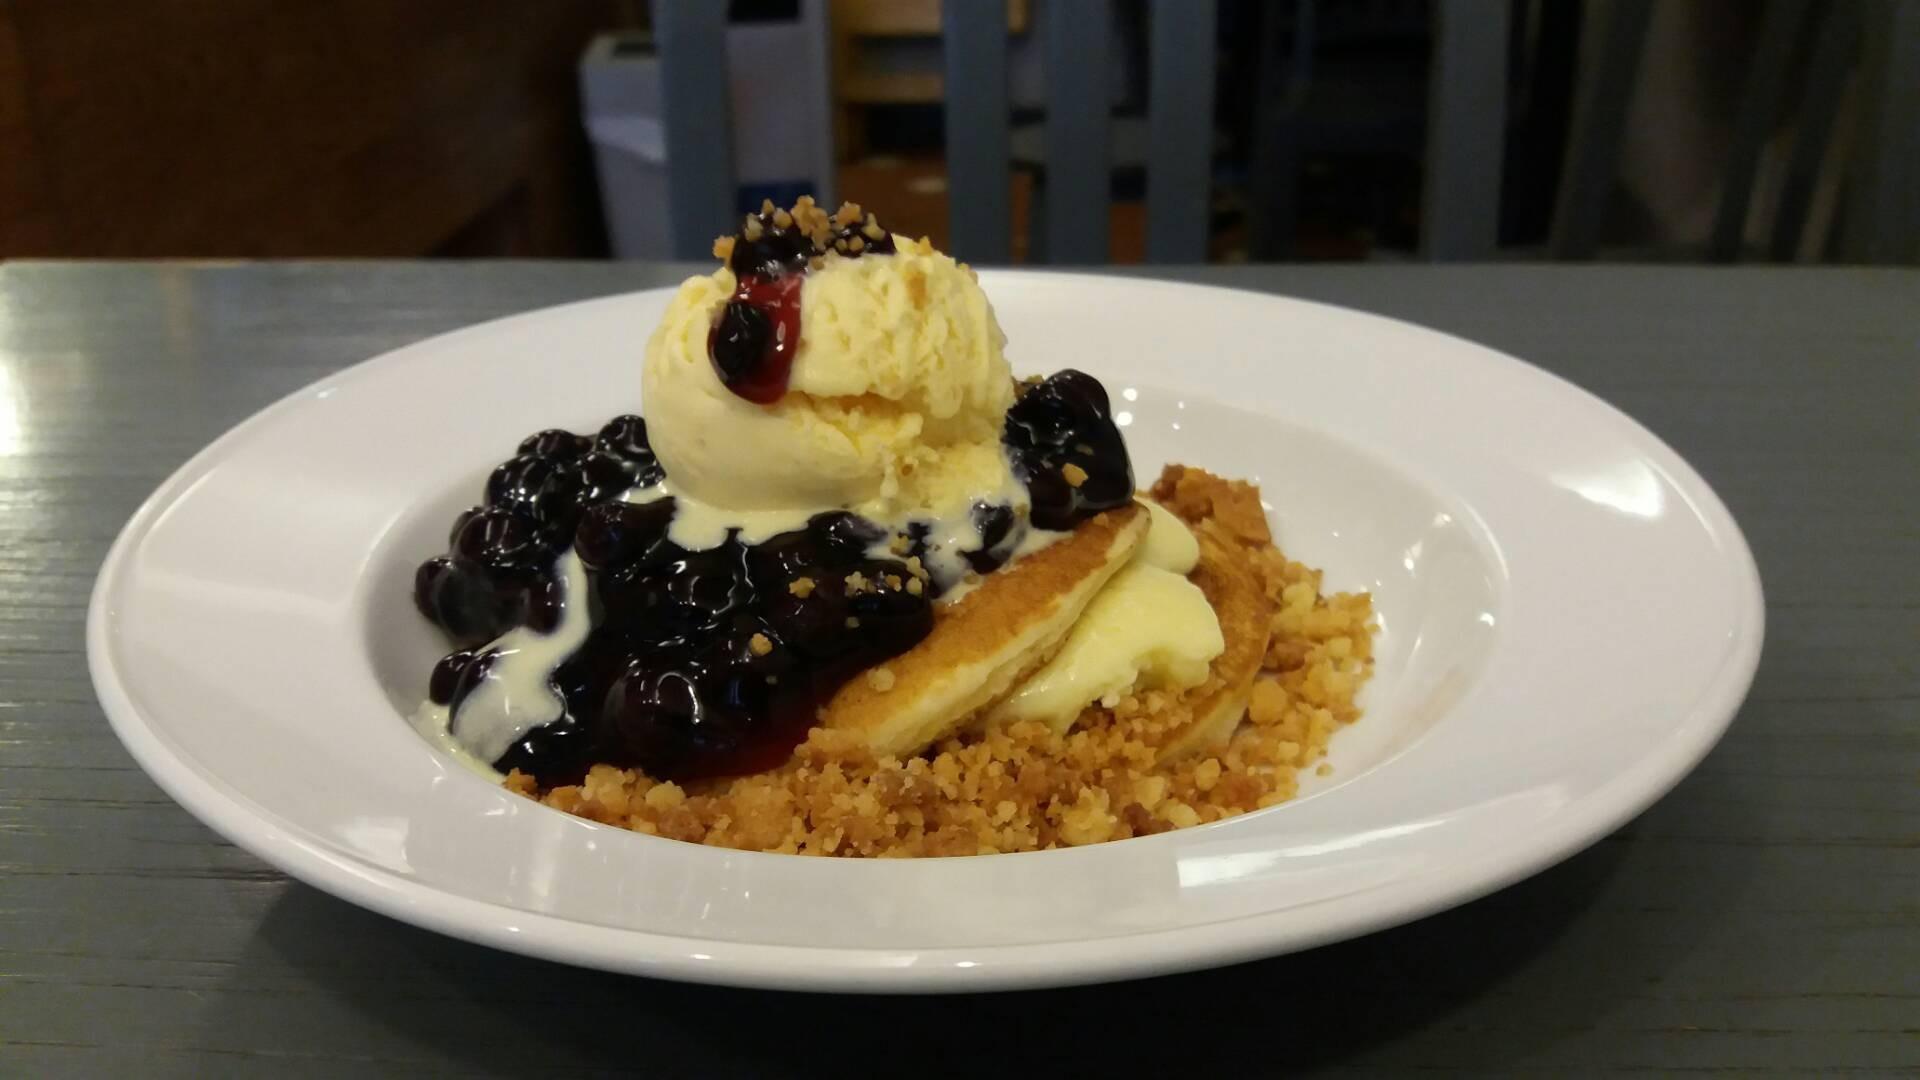 Blueberry Creamcheese Pancake(150 บาท) น่าอร่อยมากกก